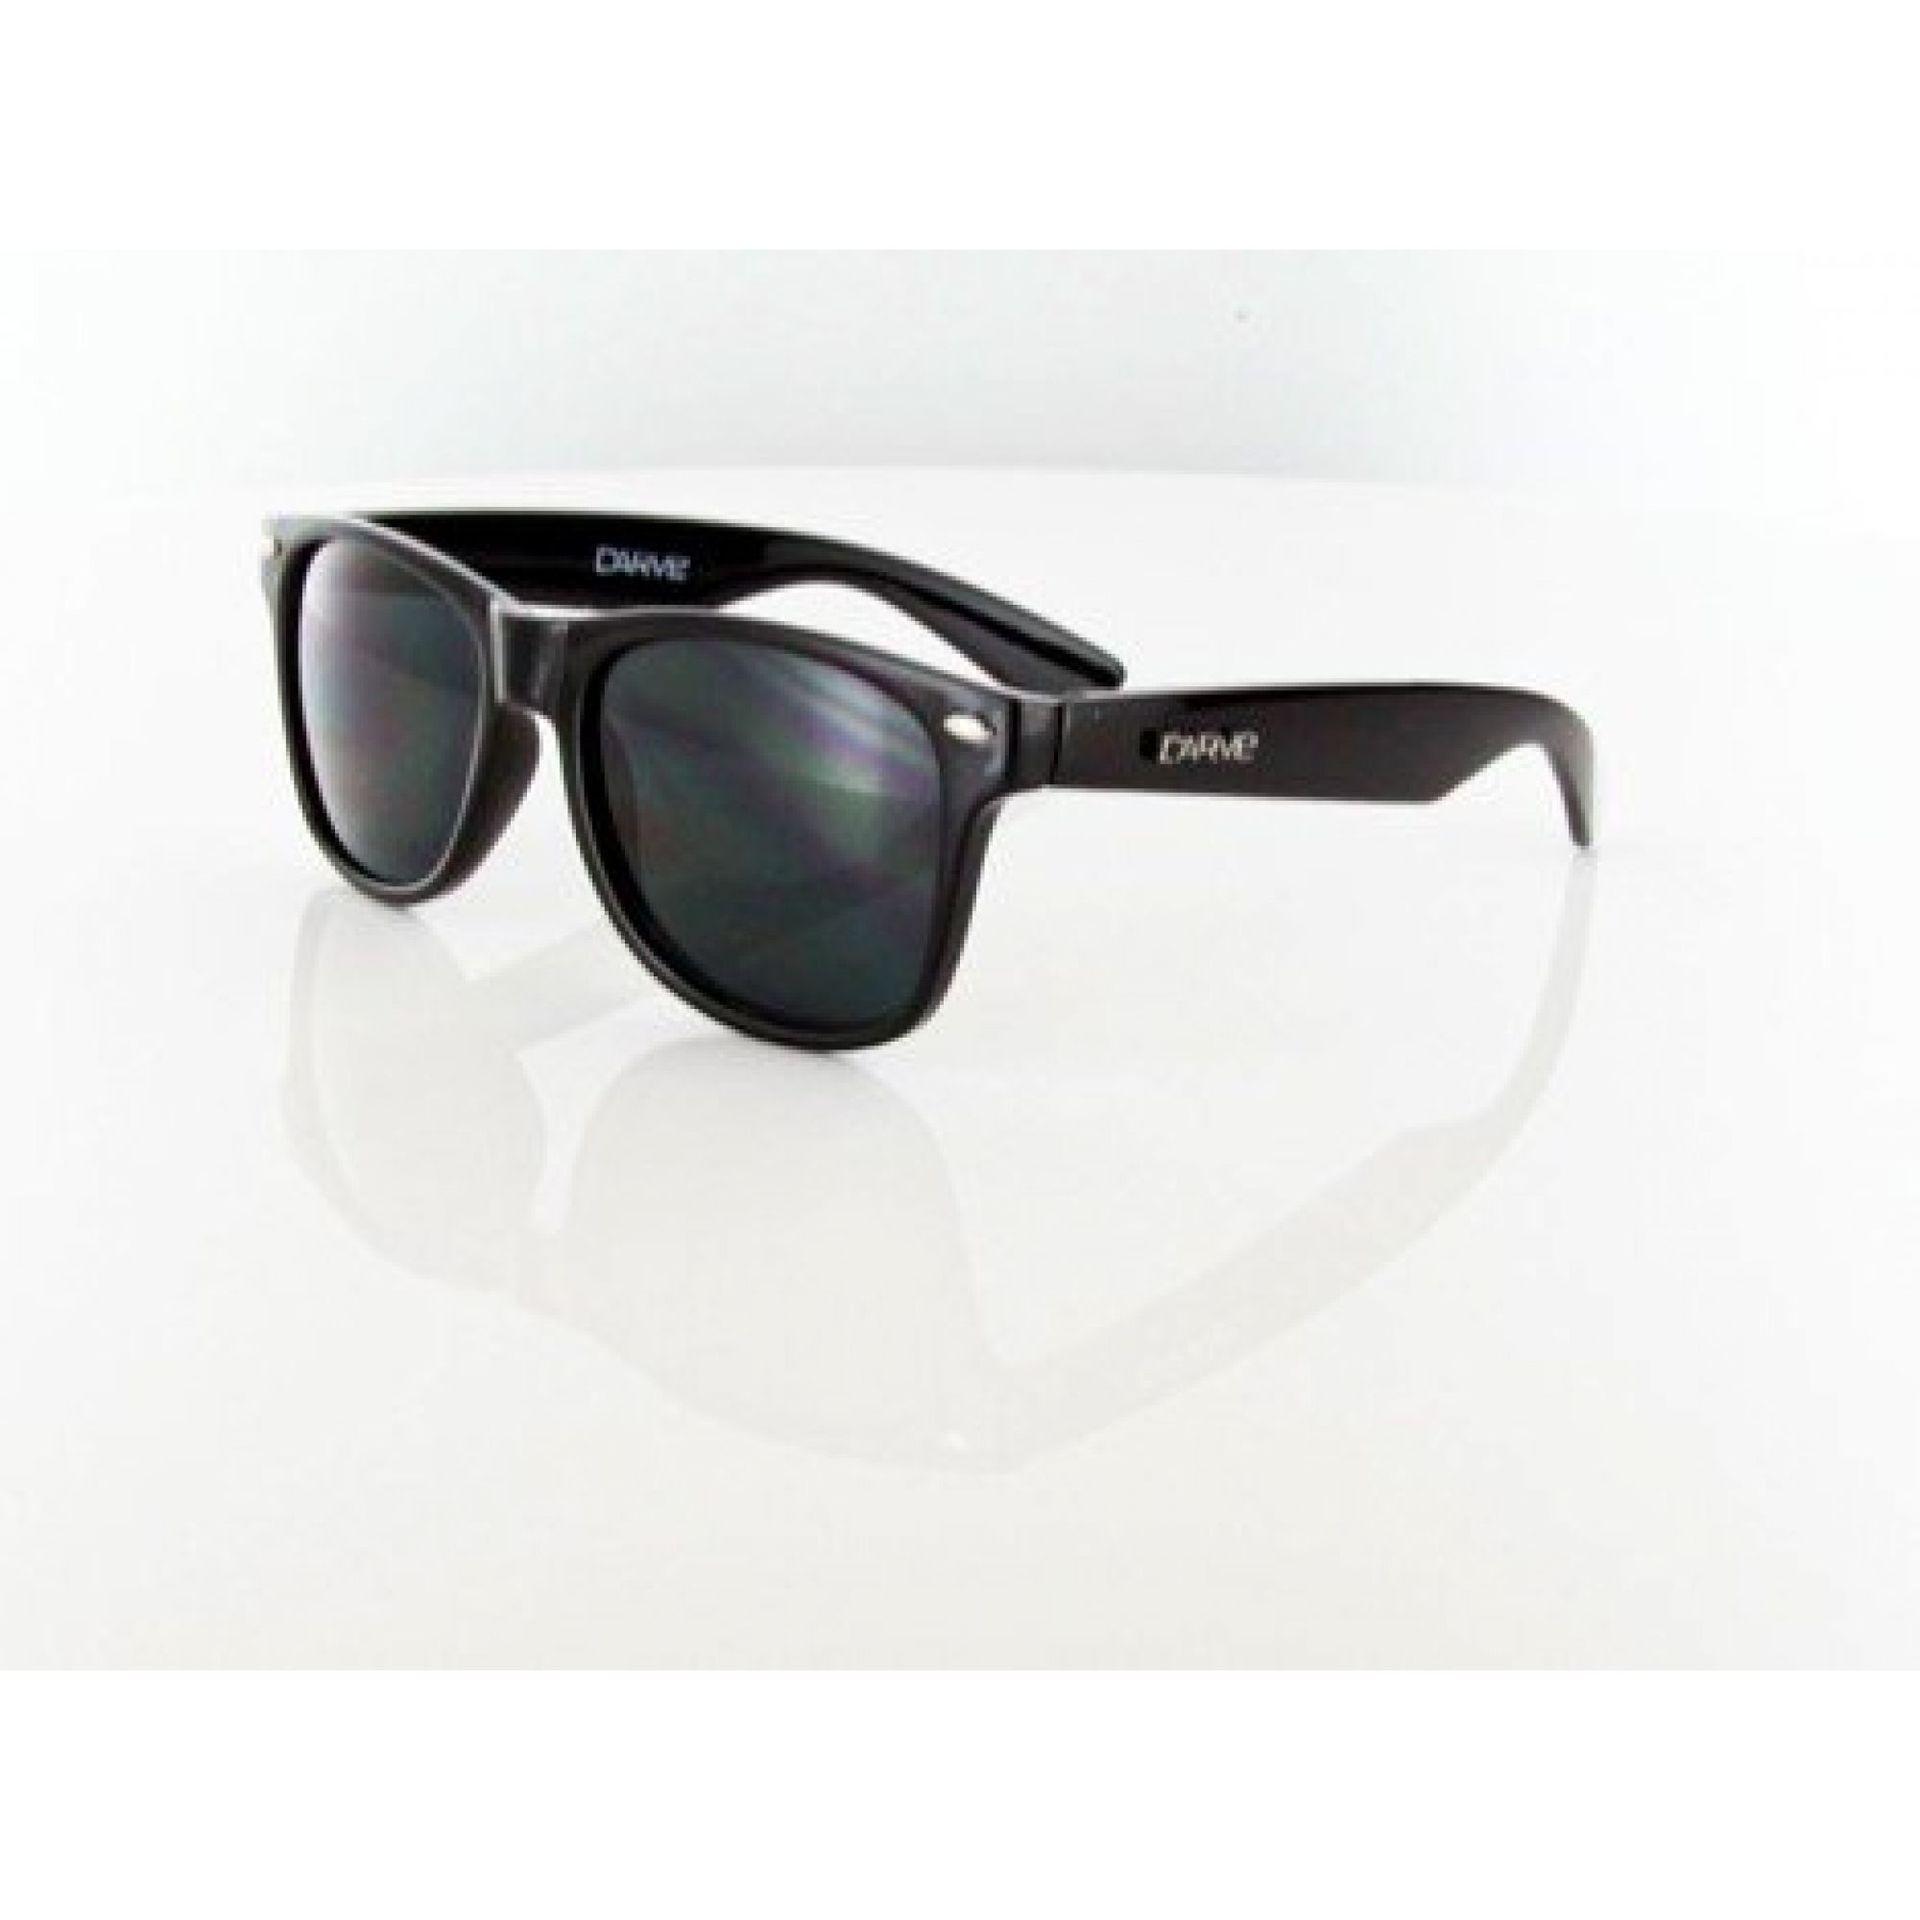 Okulary Carve Digger czarne